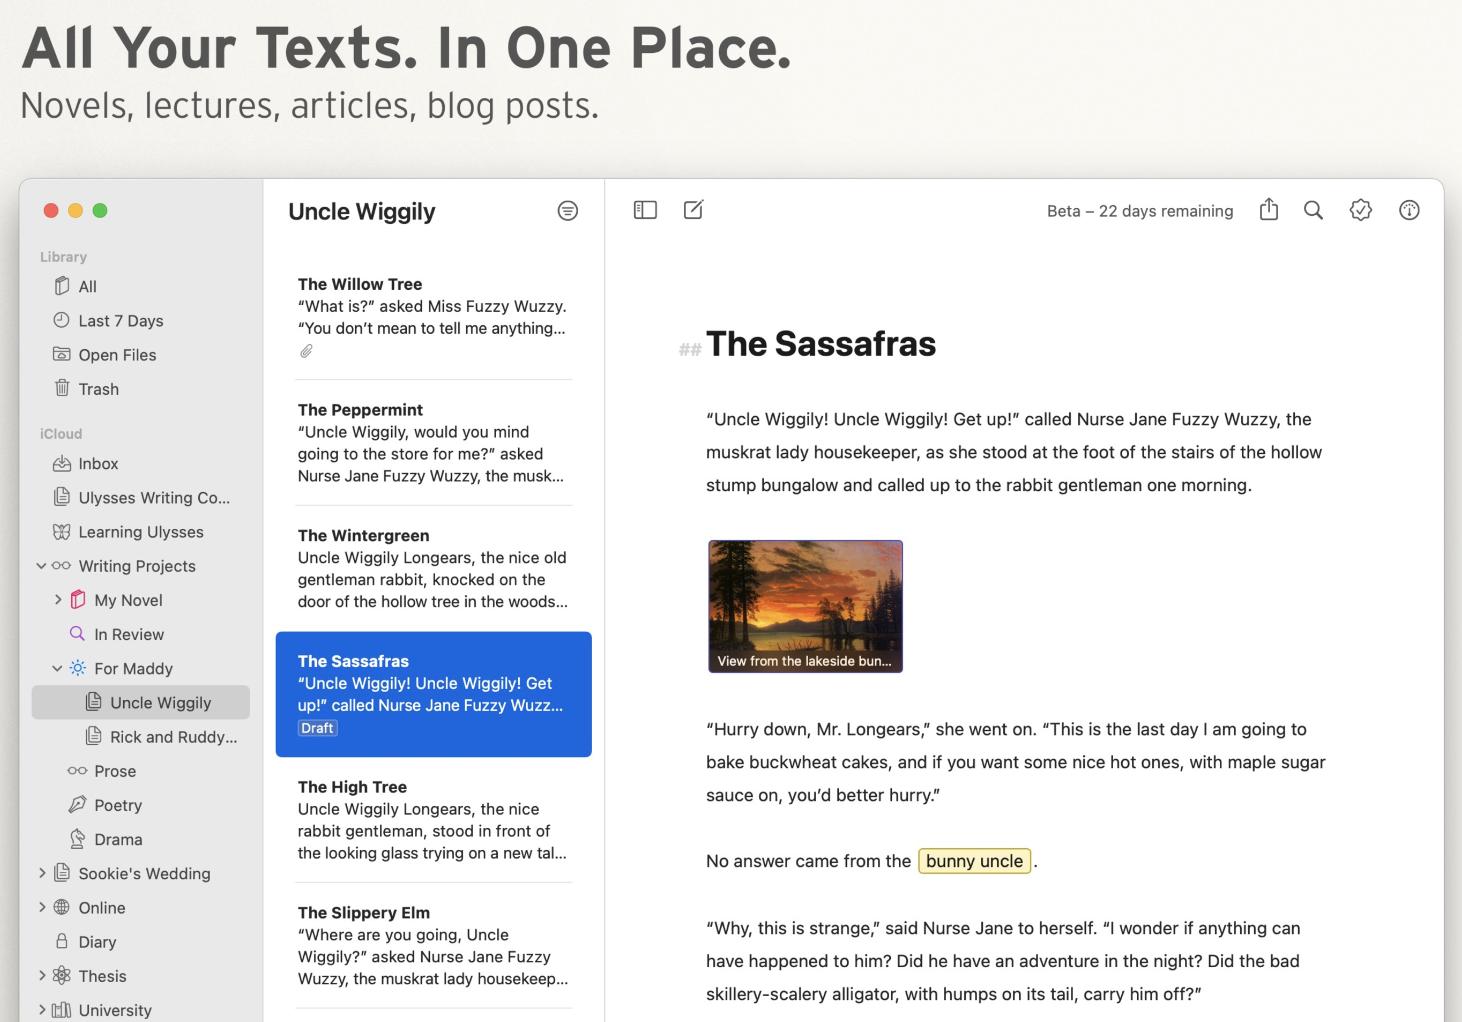 screenshot of Ulysses Writing App user interface